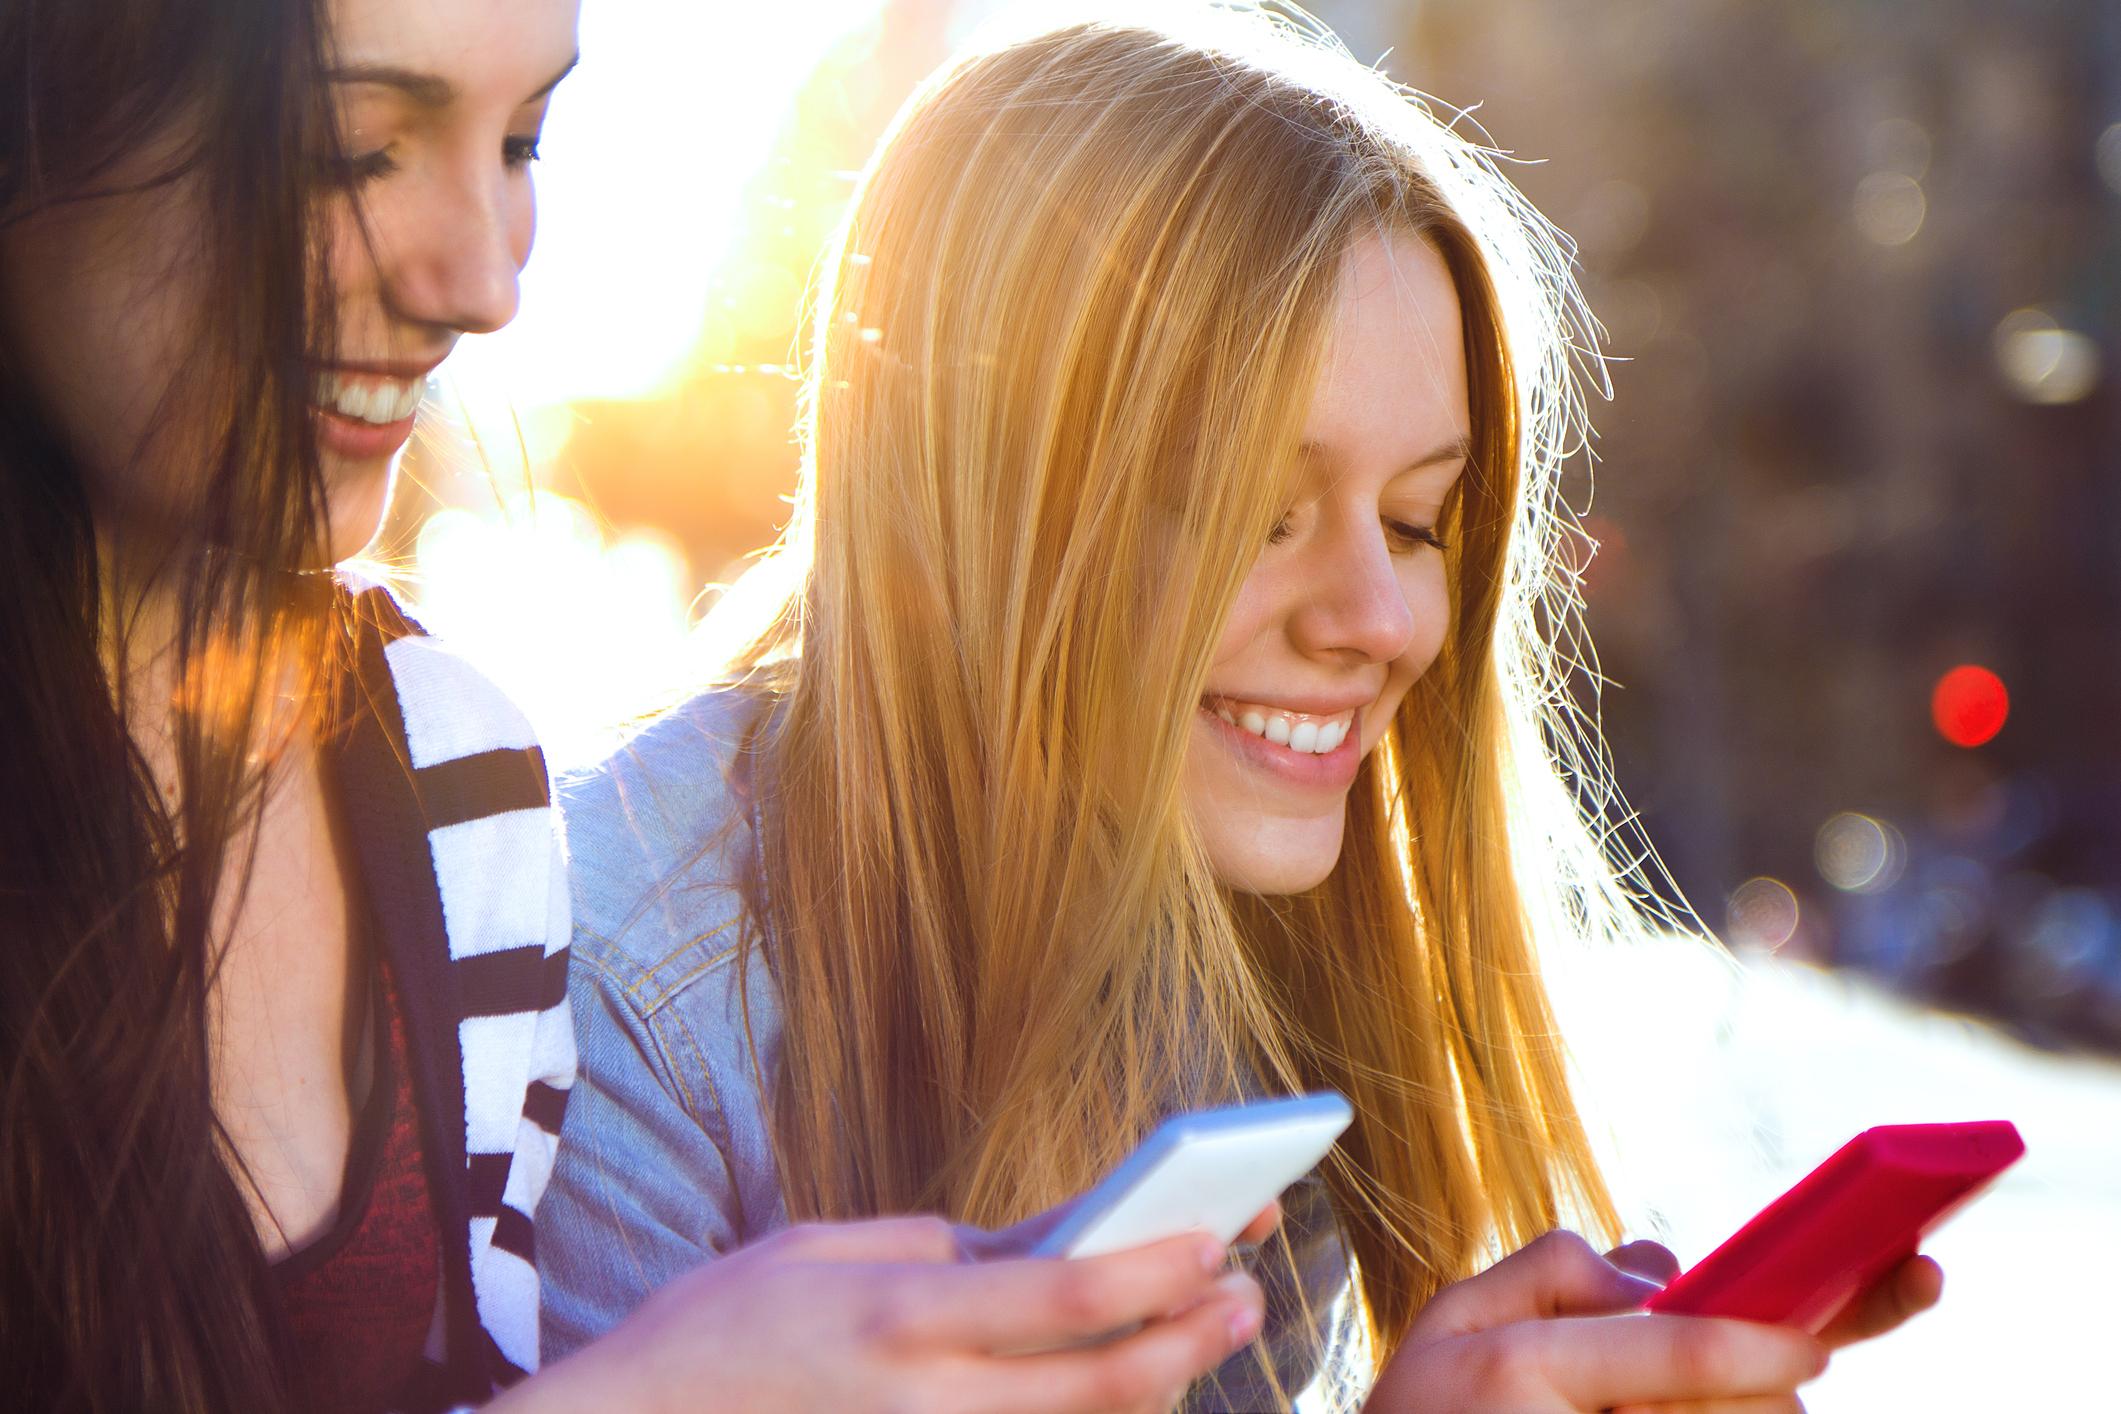 Millennials checking their smartphones.